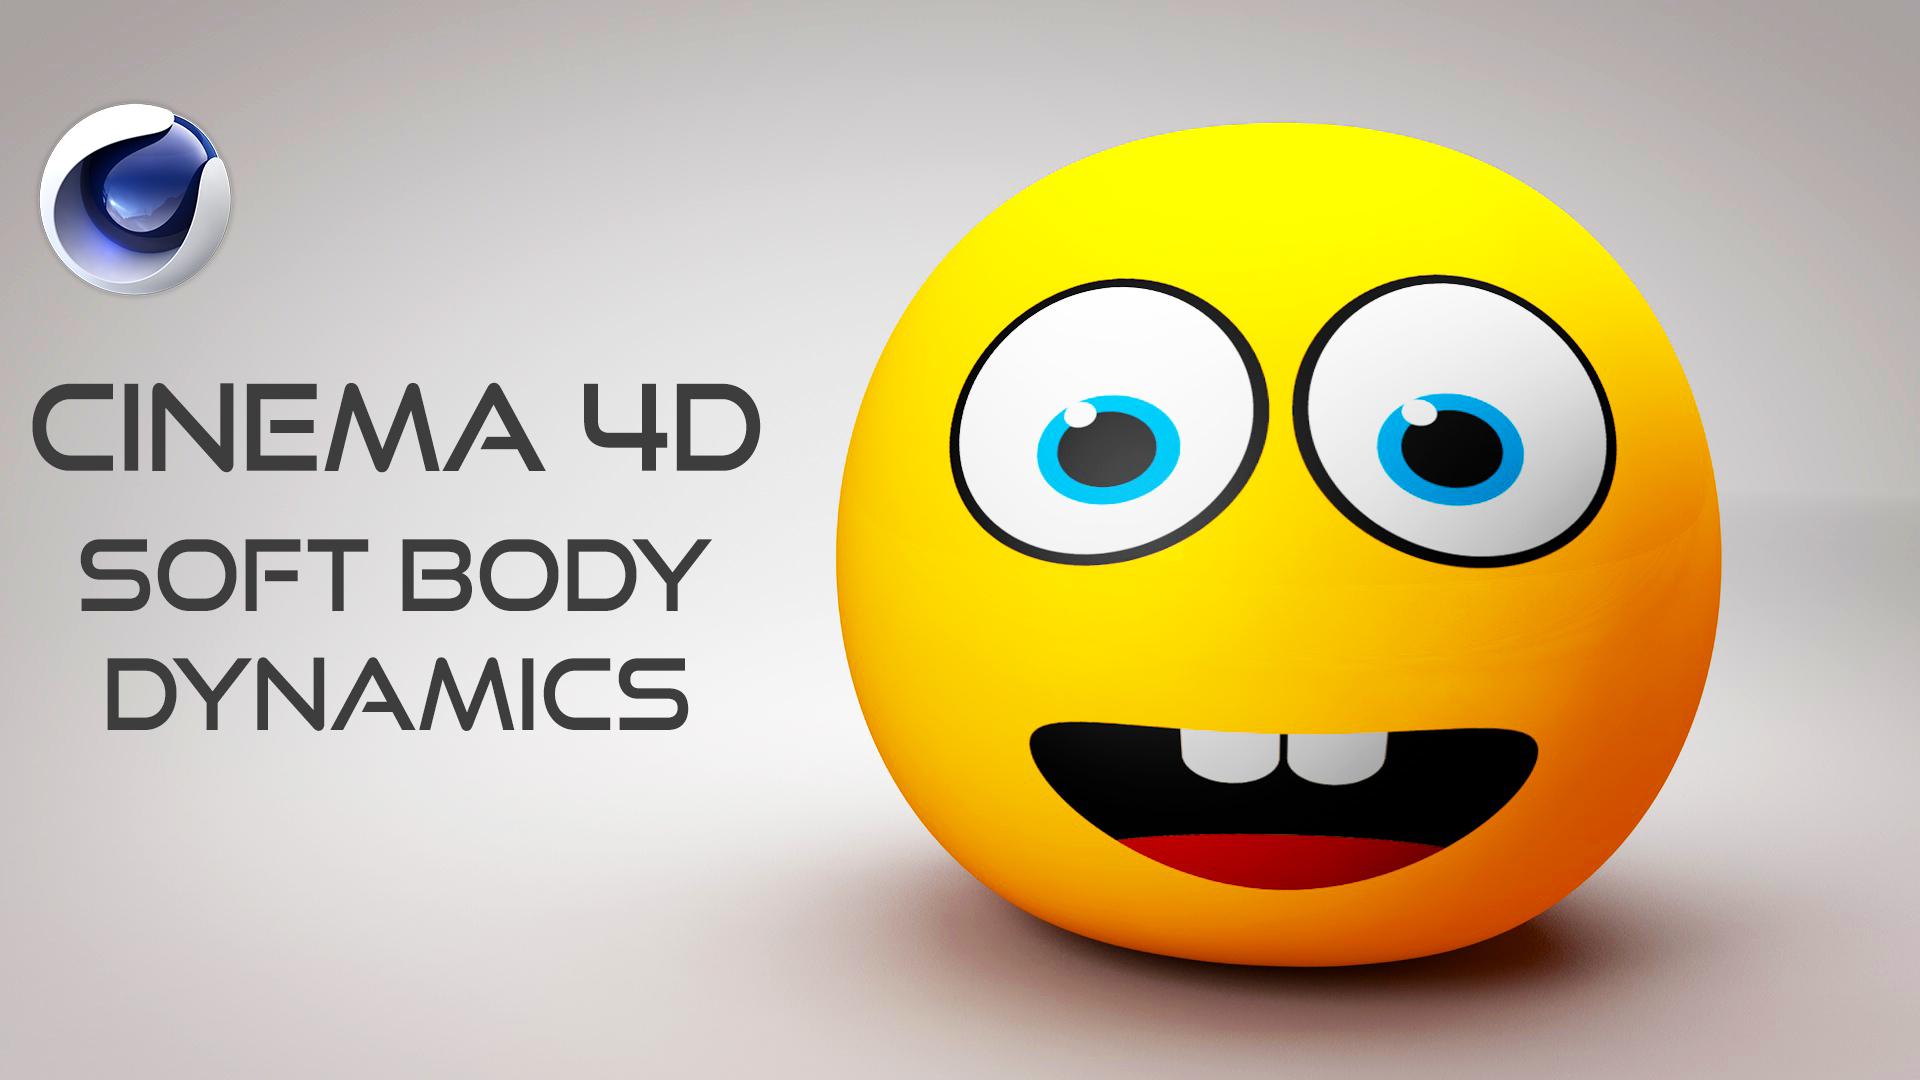 Cinema 4D Soft Body Animation Tutorial - Fattu Tutorials